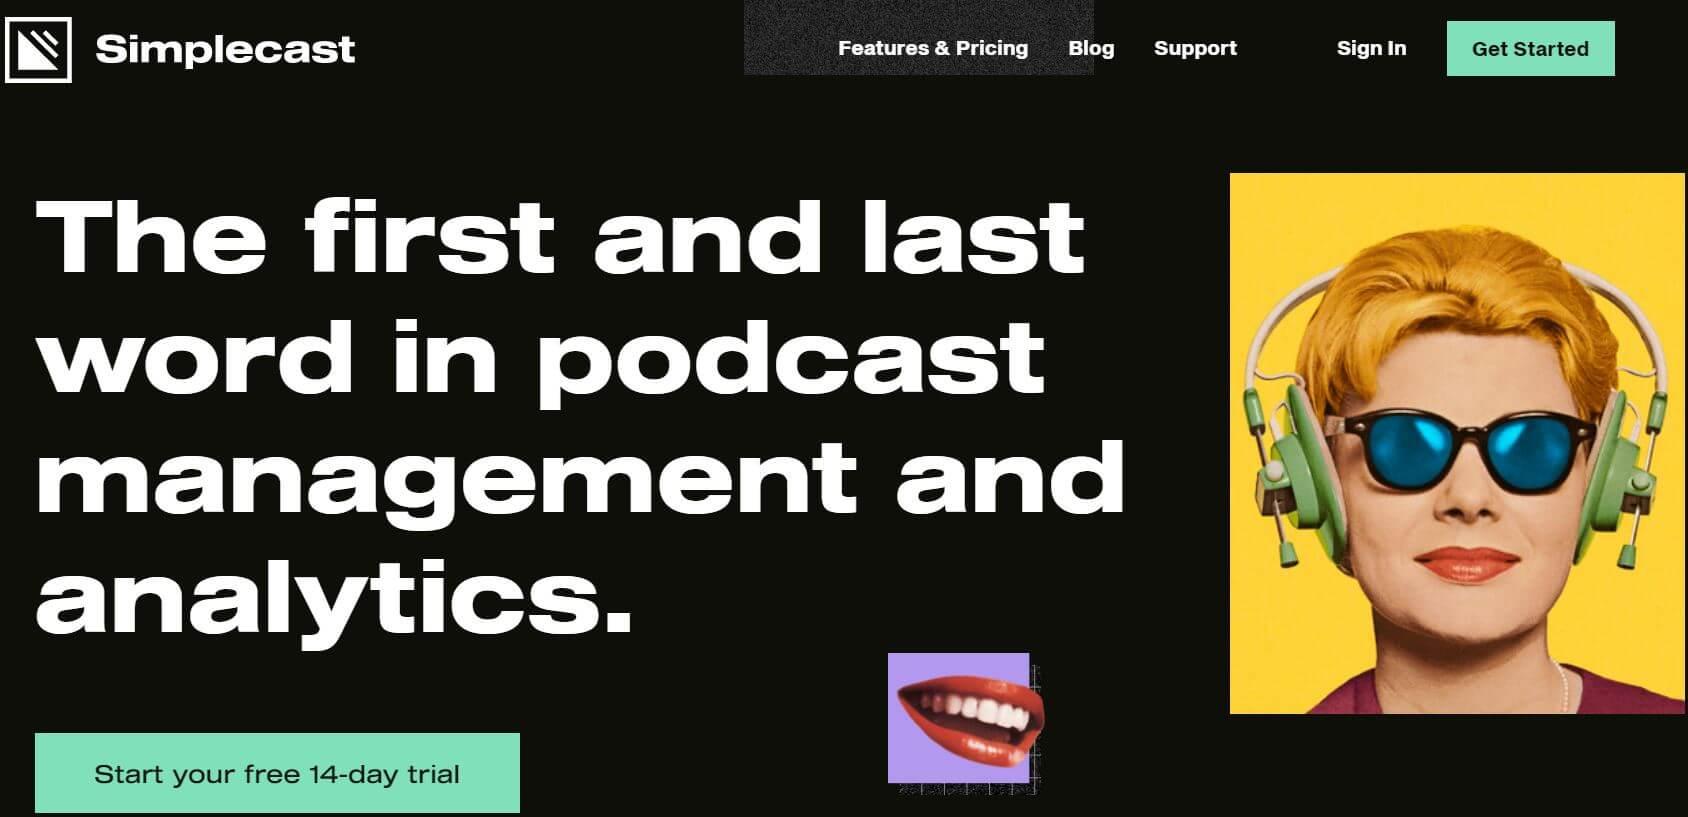 nen-tang-luu-tru-podcast-tot-nhat-simplecast